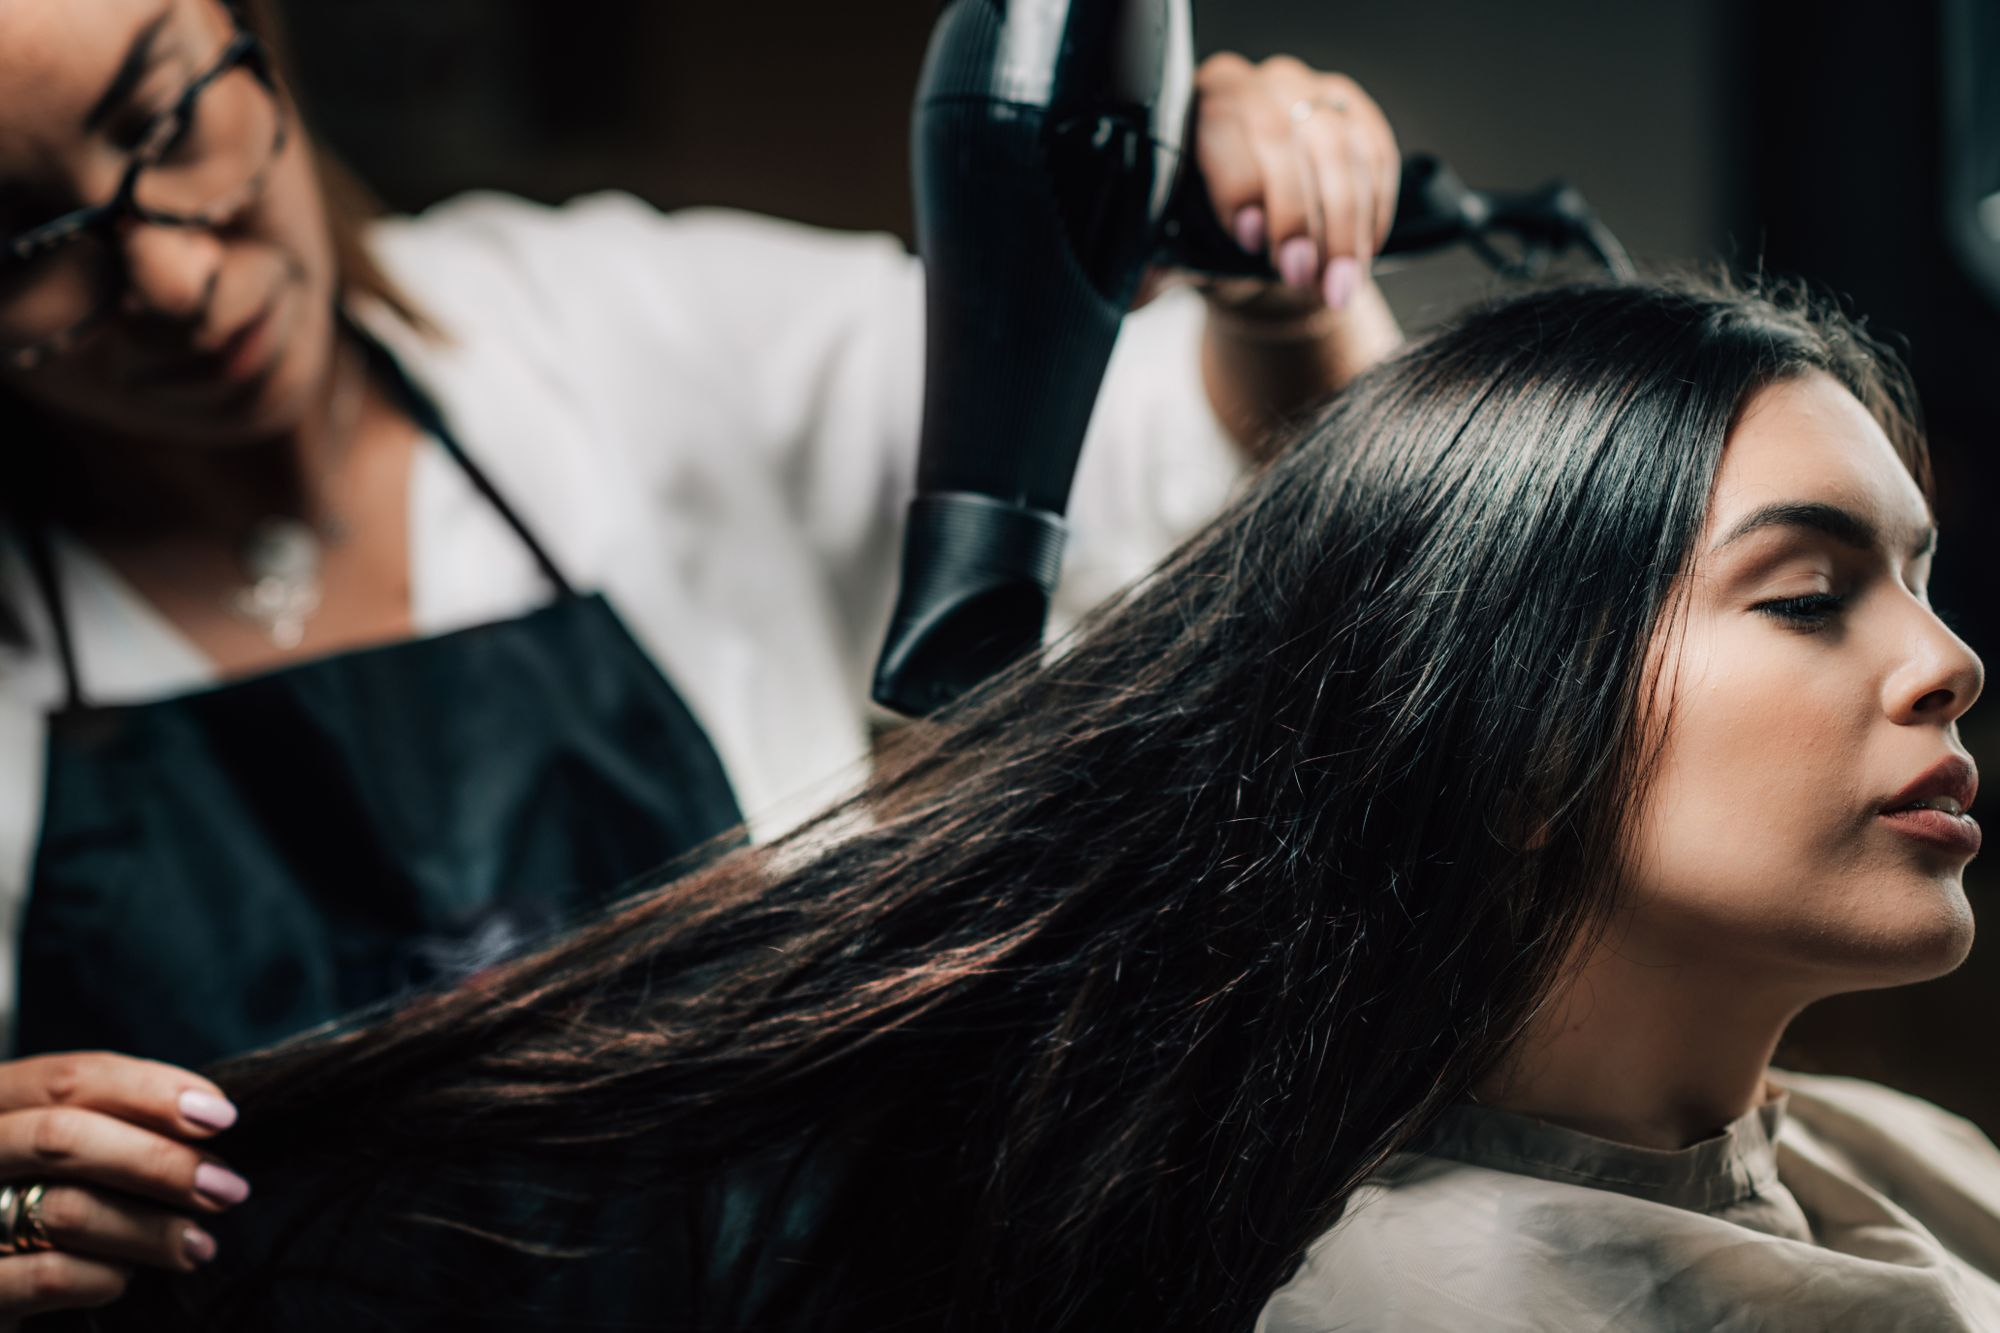 hair-salon-hairdresser-drying-hair-FJ6XAZ9.jpg